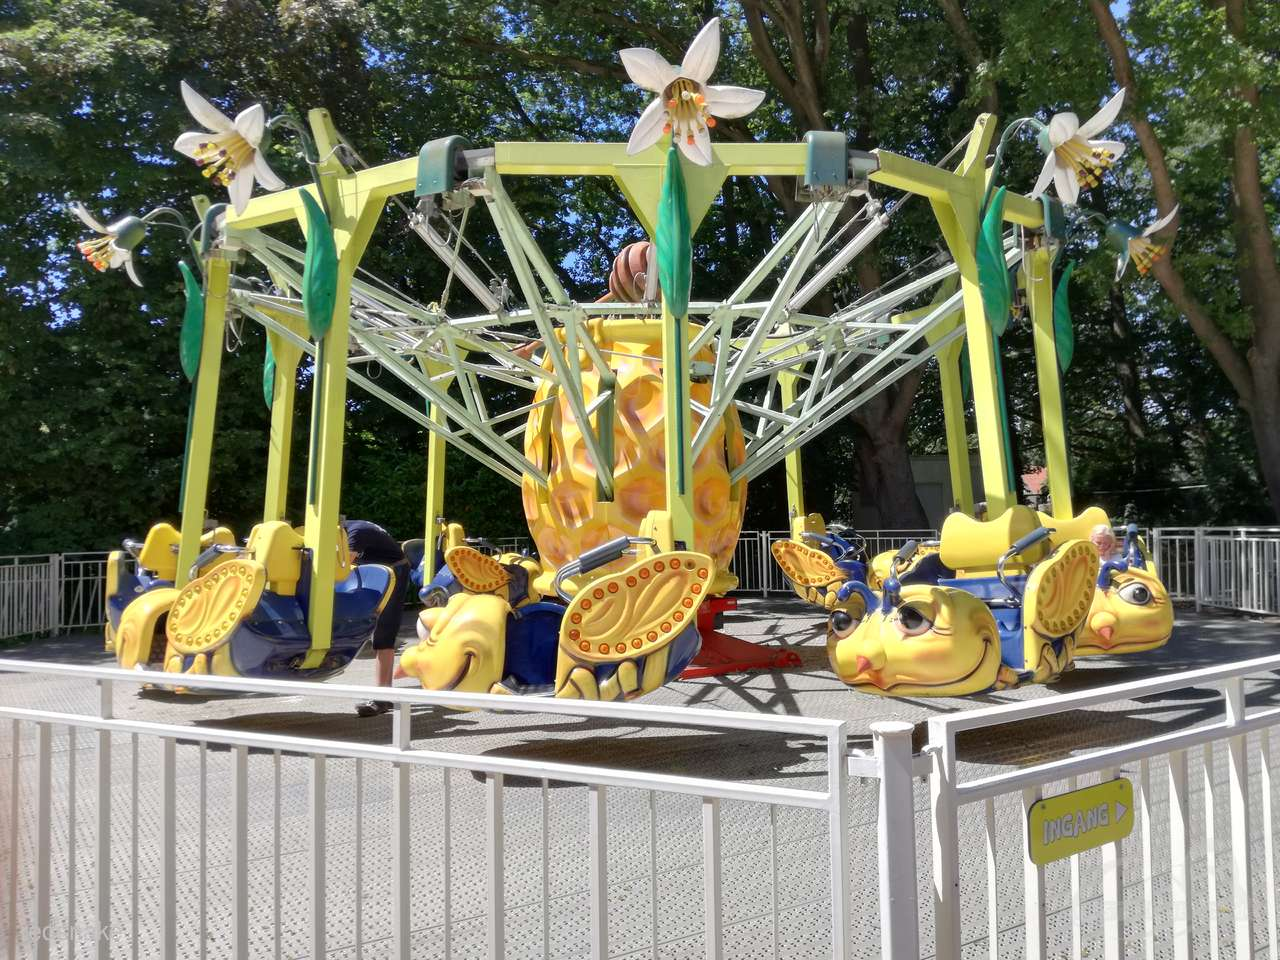 Amusementspark Tivoli Impressionen